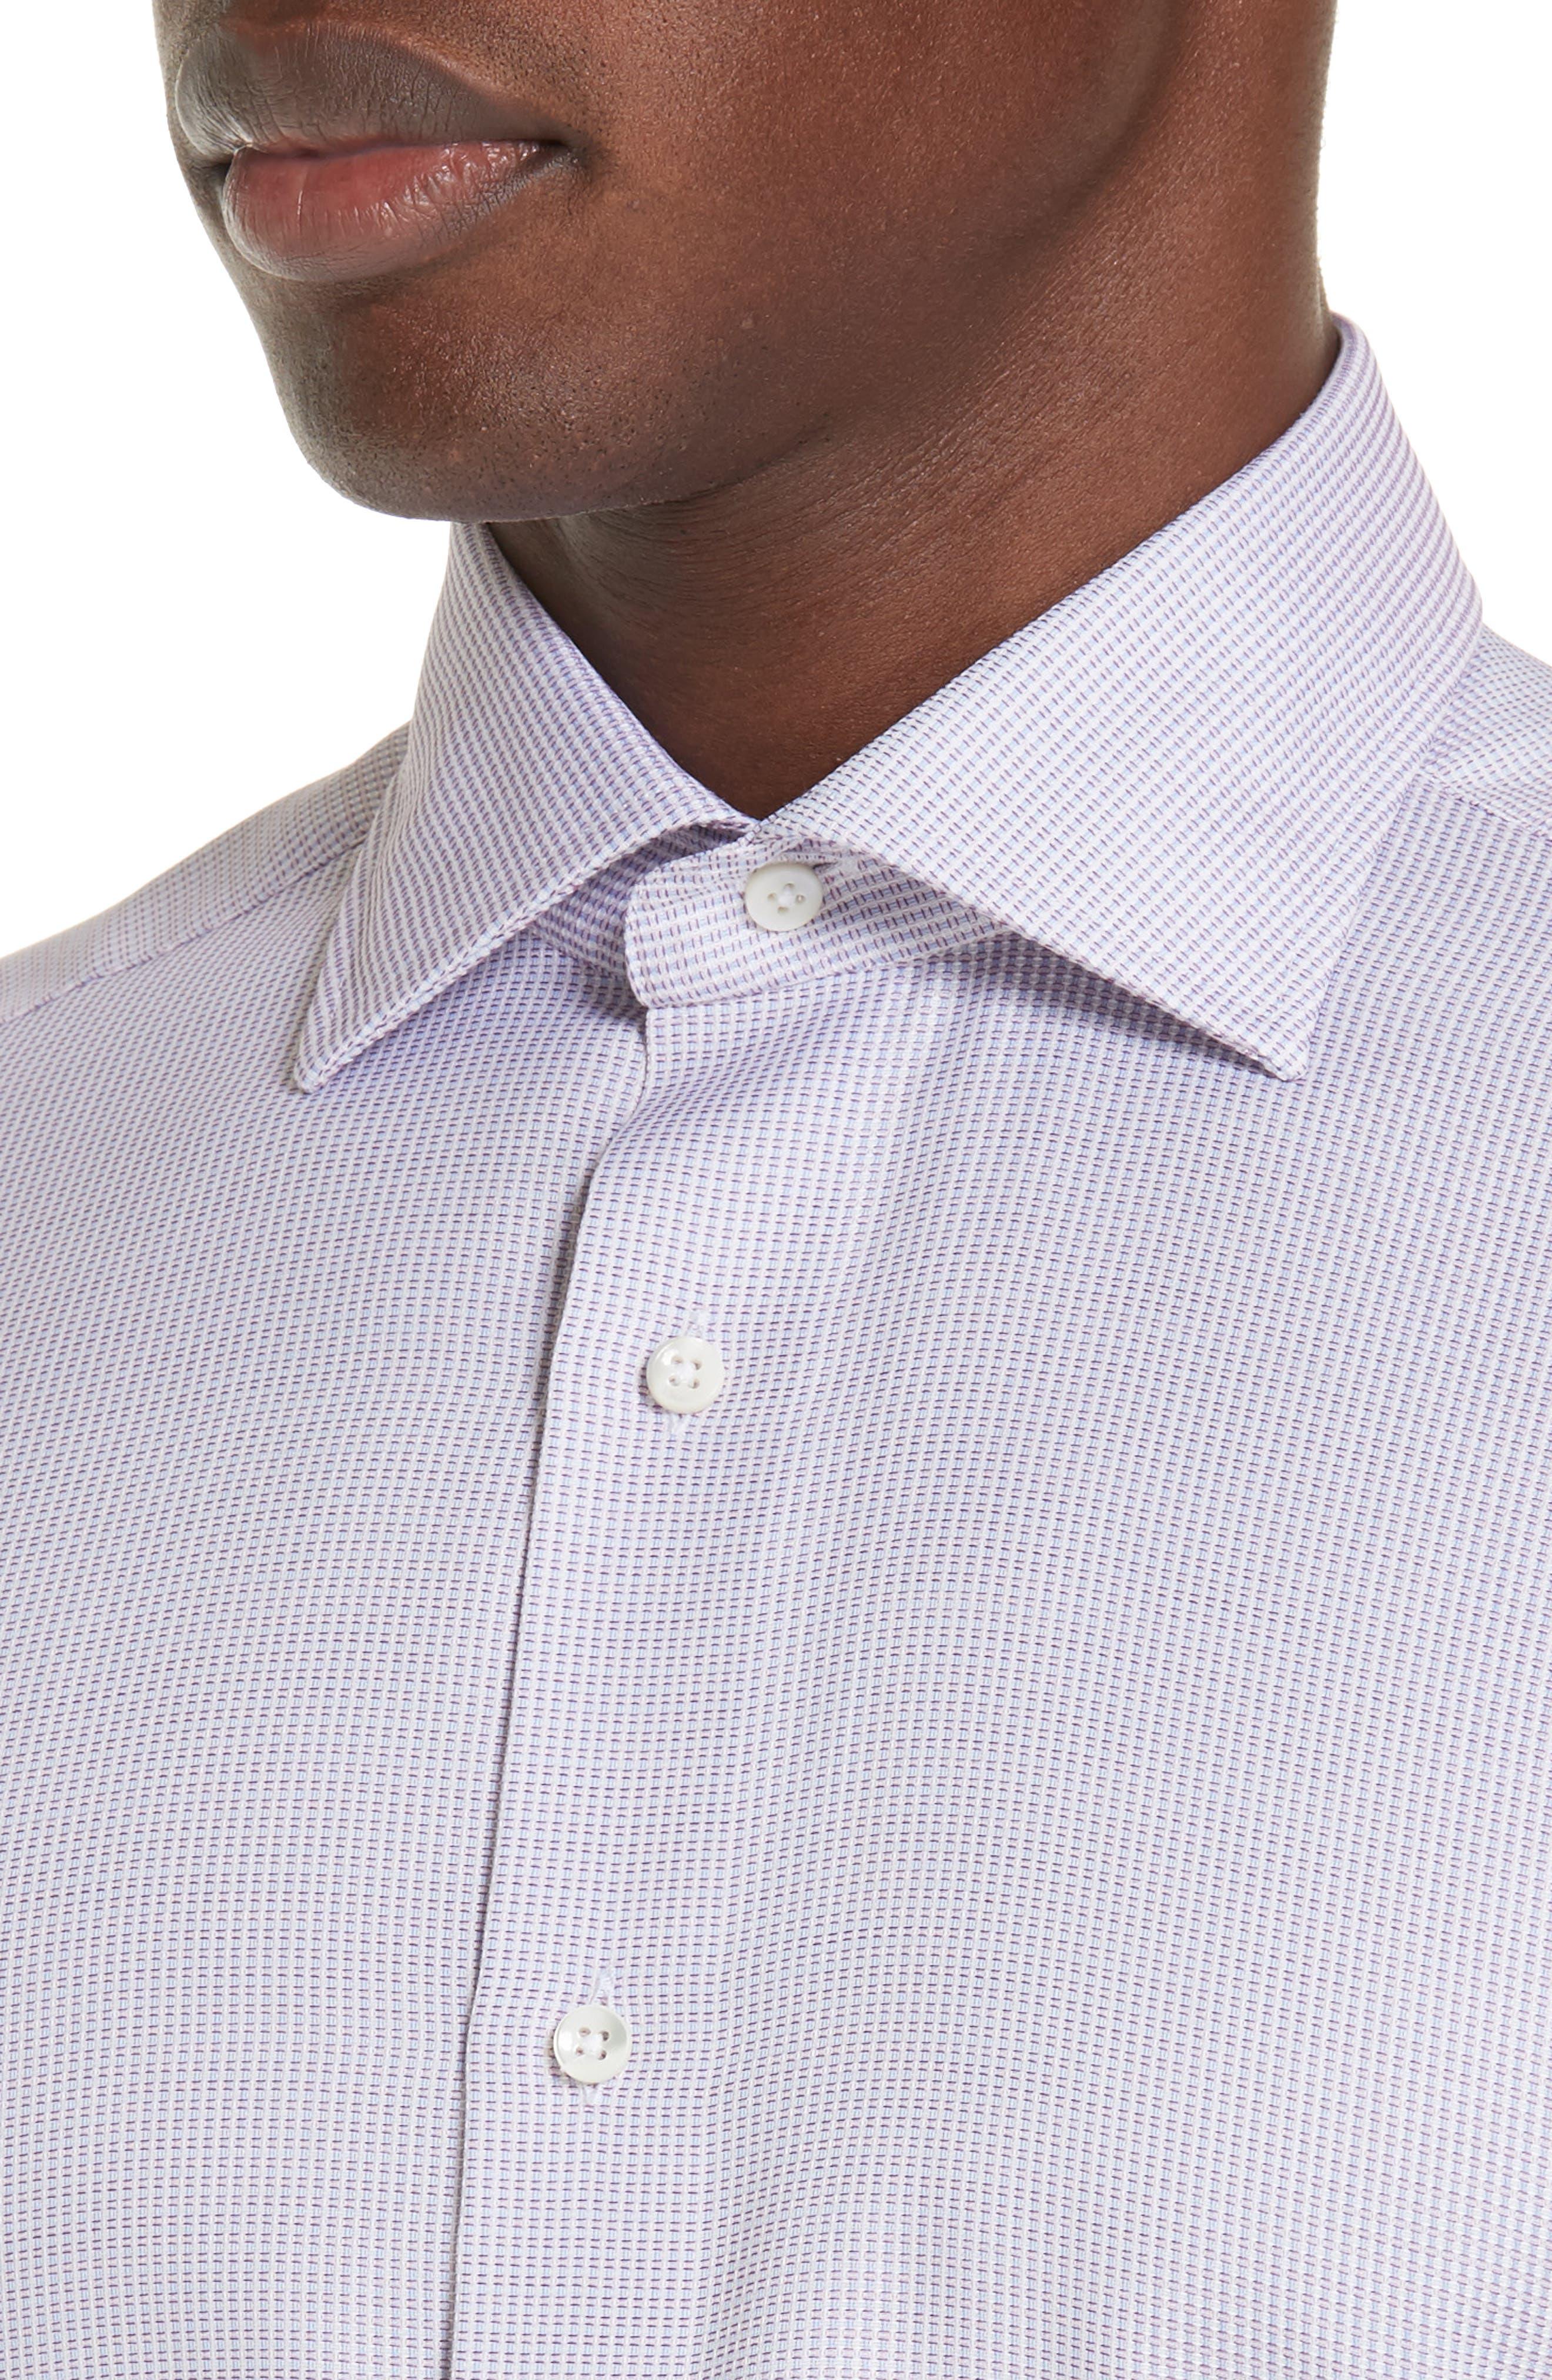 Regular Fit Stripe Dress Shirt,                             Alternate thumbnail 2, color,                             Light Pink